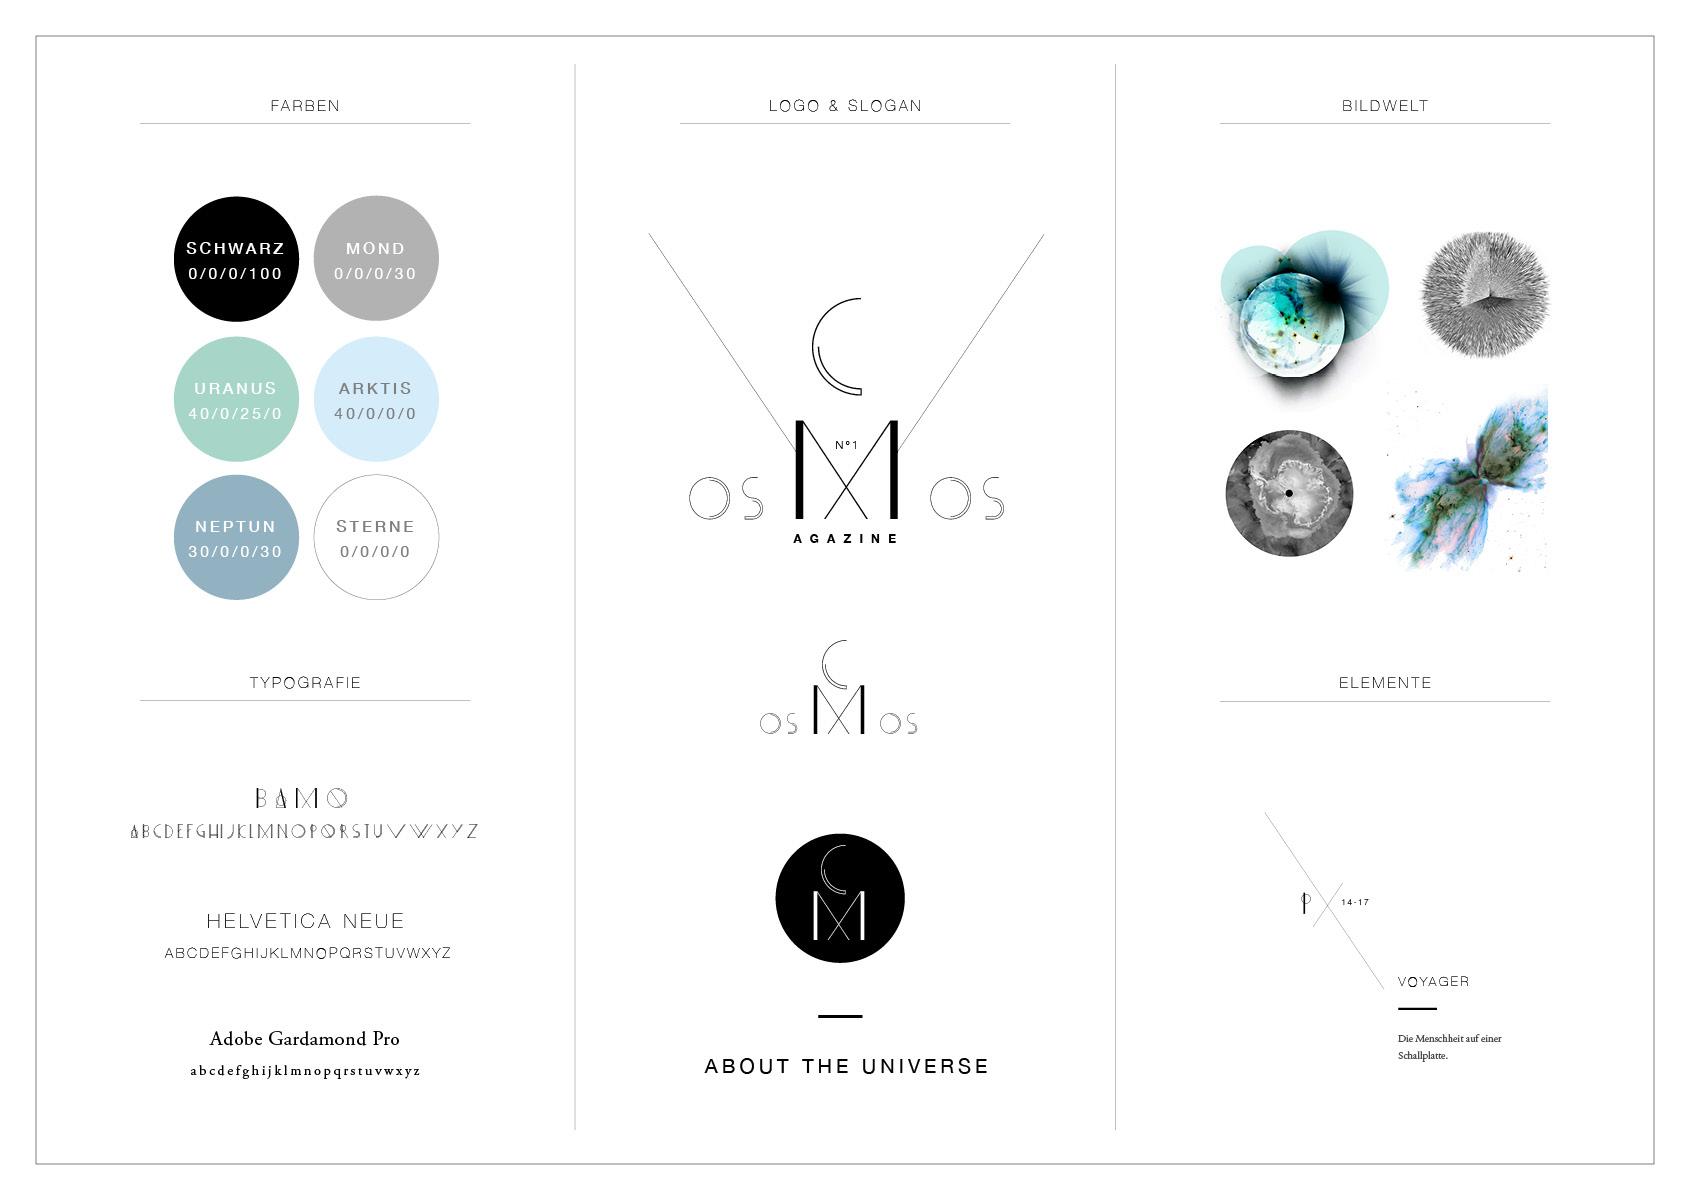 Corporate Design_Cosmos-Magazin_hsrm-Hochschule-RheinMain_Editorial-Design_Grafikdesign_Gloria-Kison.jpg